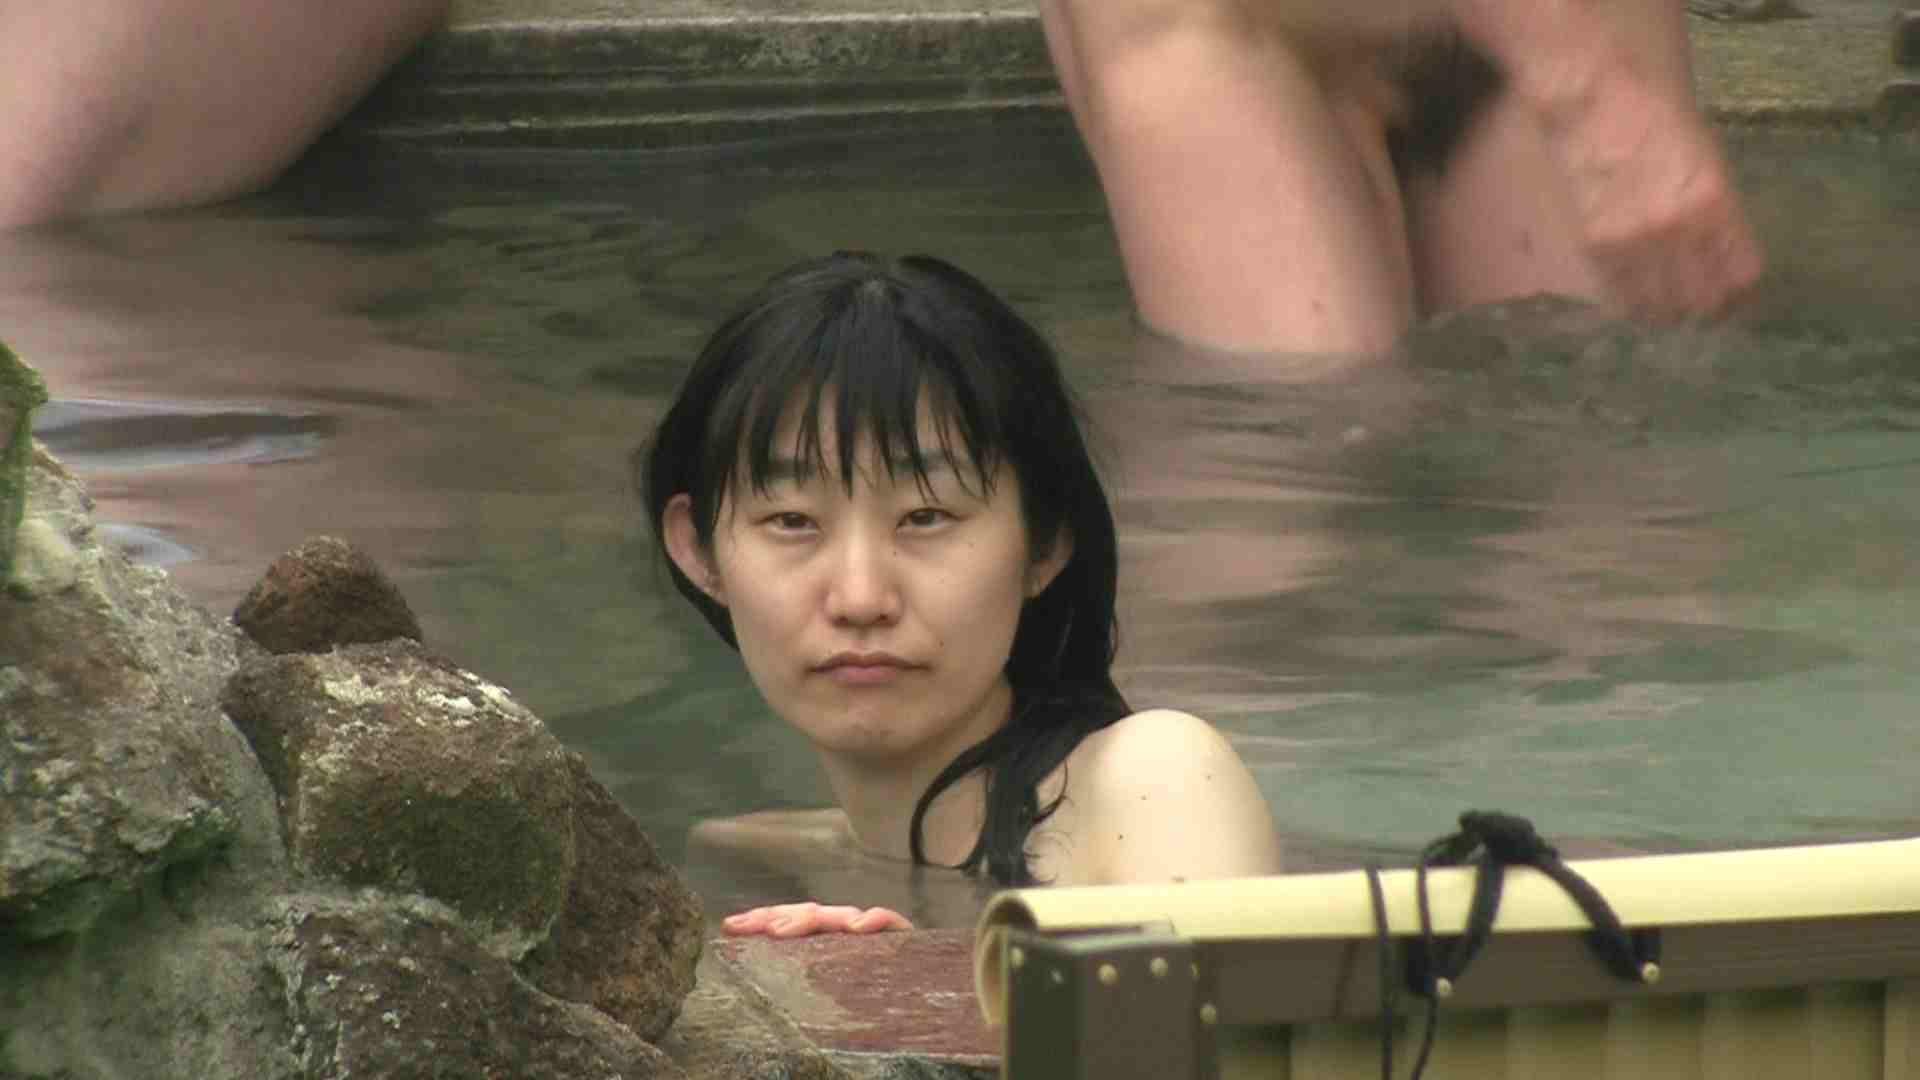 Aquaな露天風呂Vol.14【VIP】 盗撮シリーズ   露天風呂編  94PIX 47